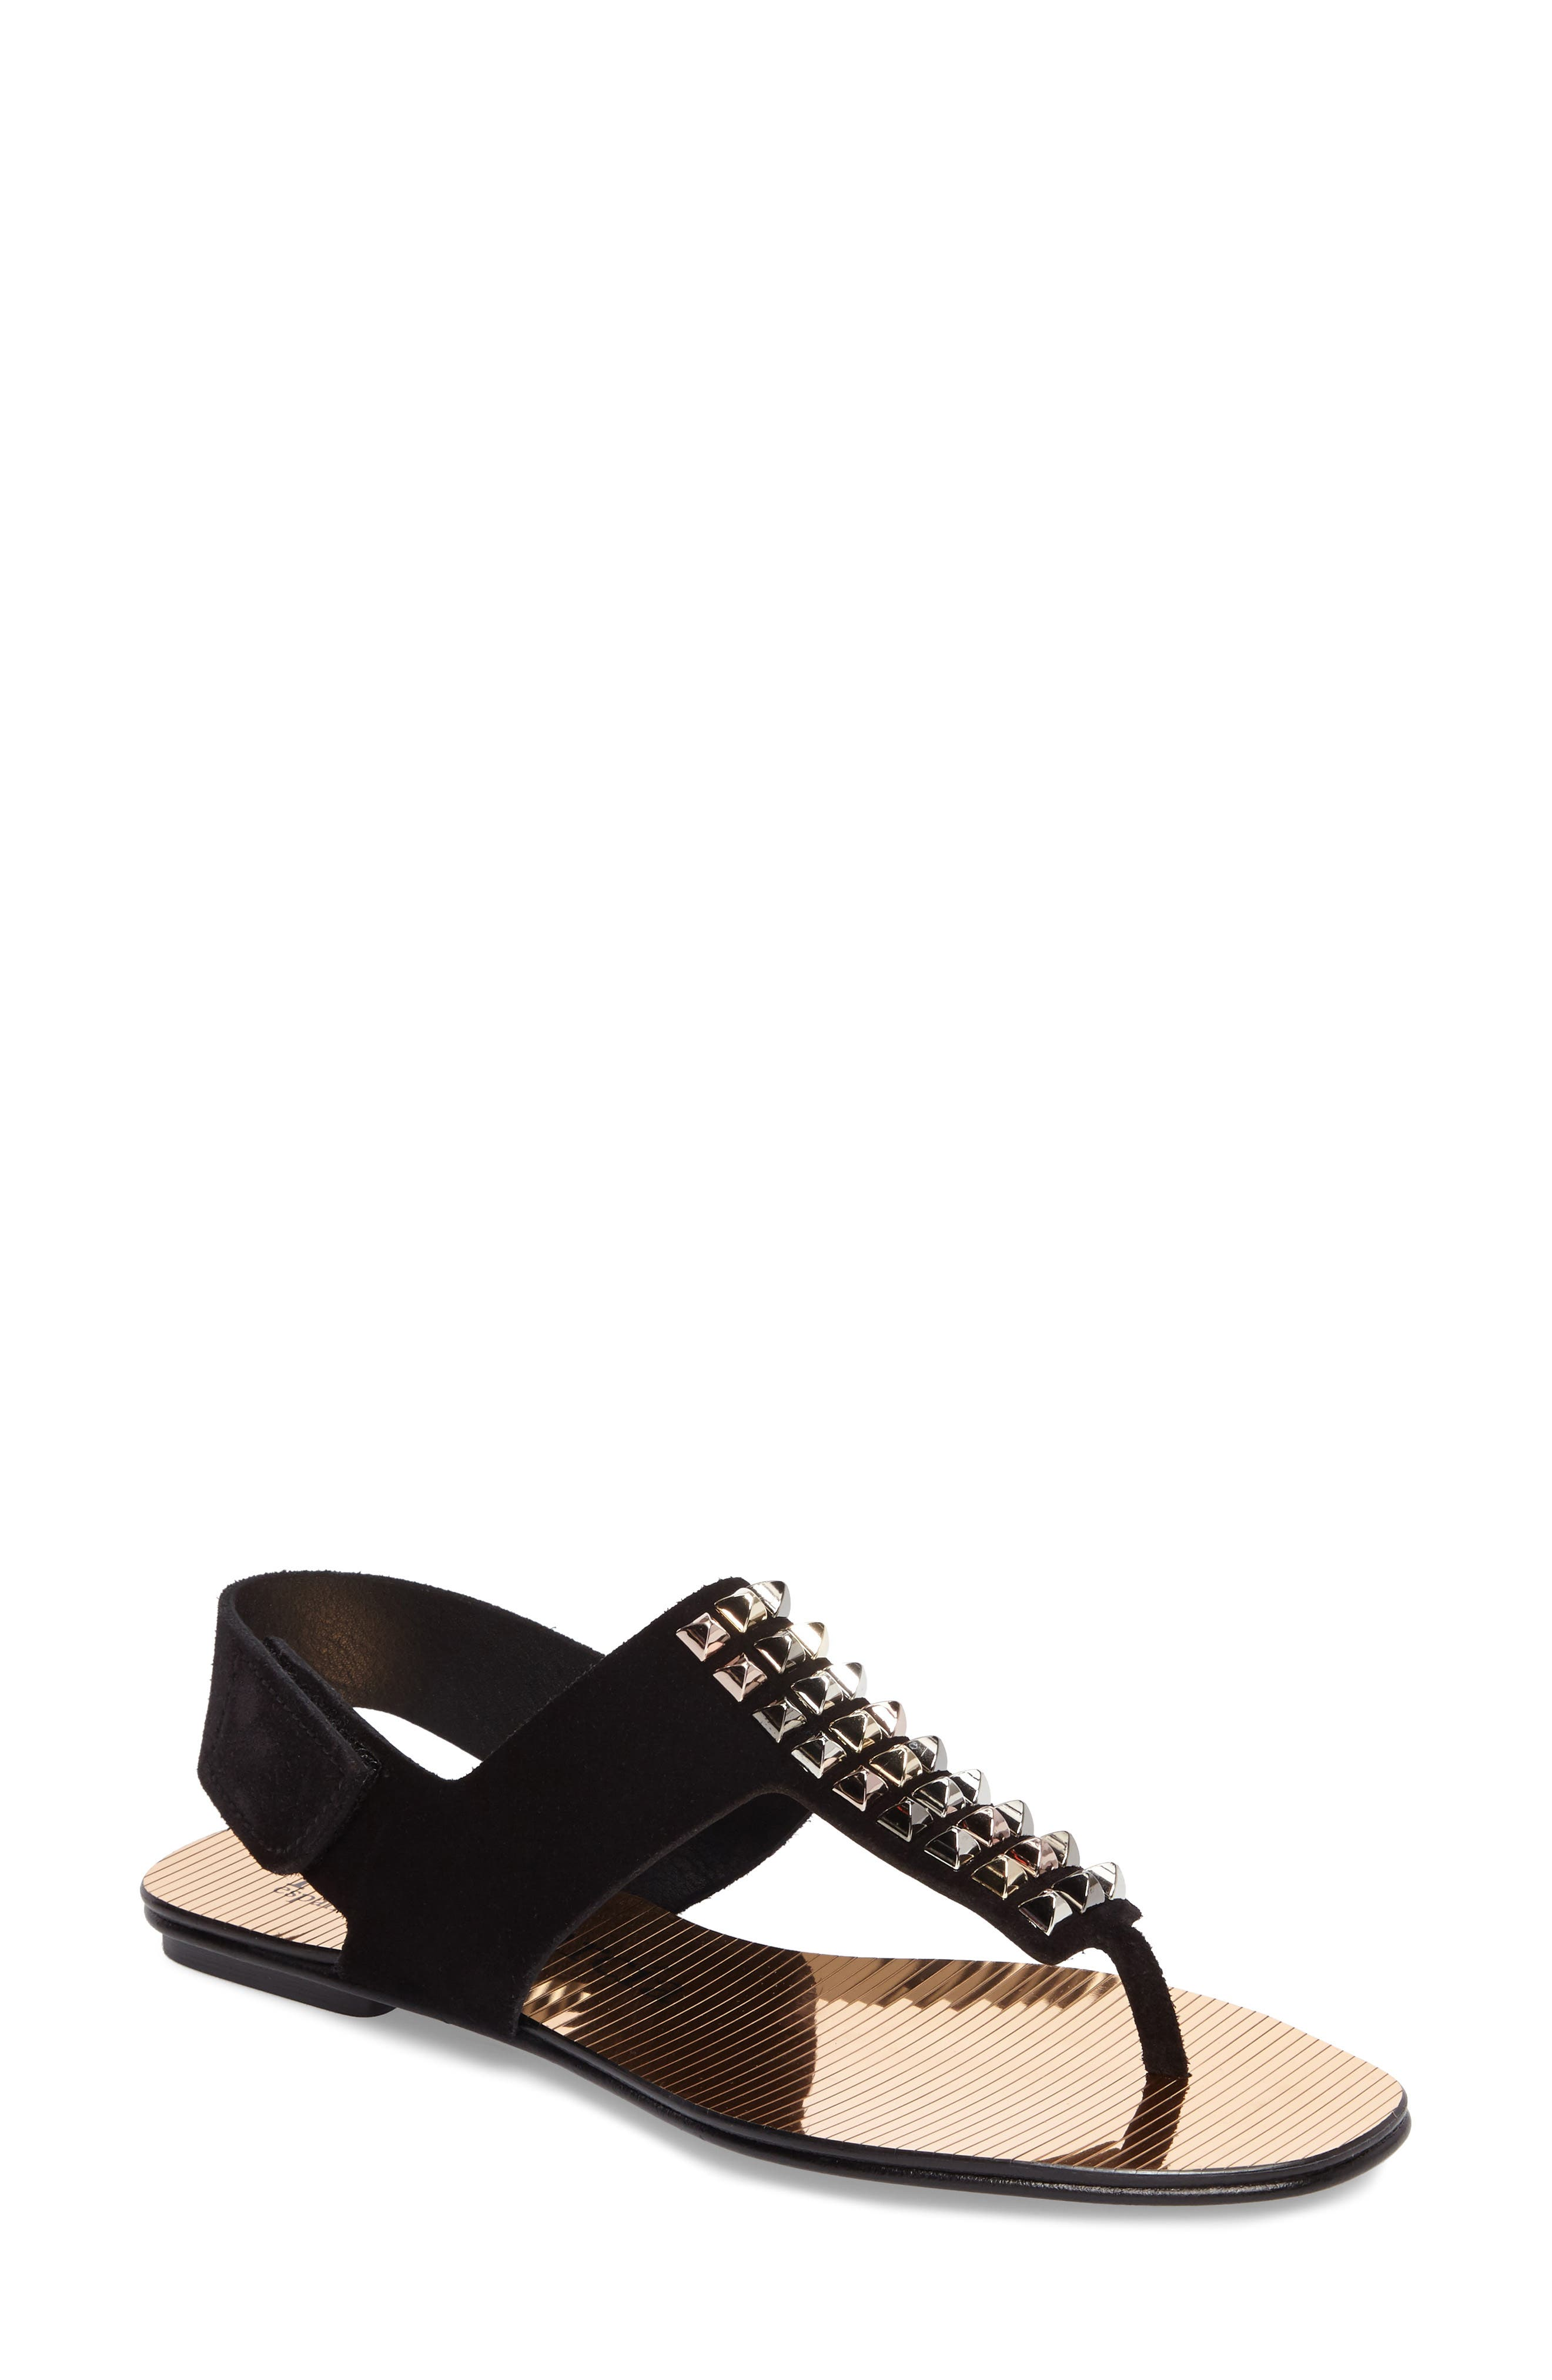 Enid Studded T-Strap Sandal,                             Main thumbnail 1, color,                             Black Castoro/ Gold